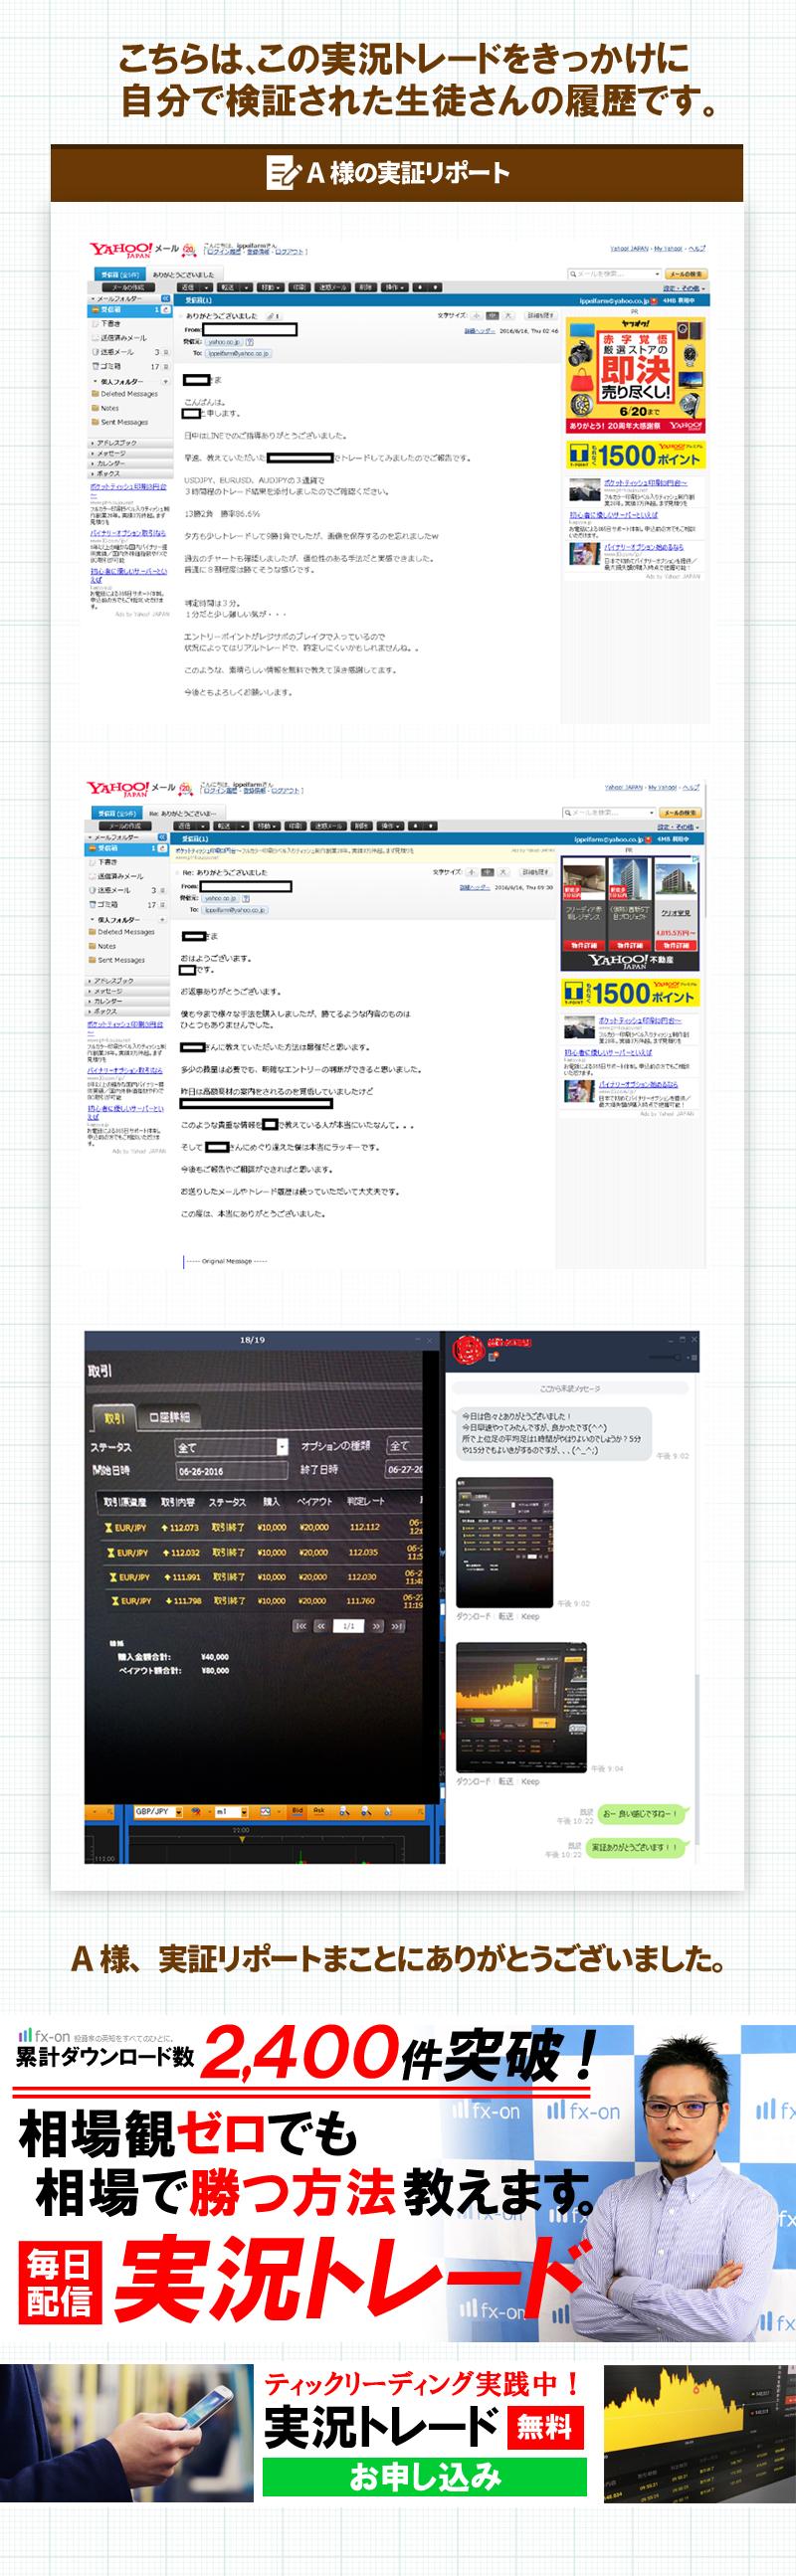 fx-on_05.jpg